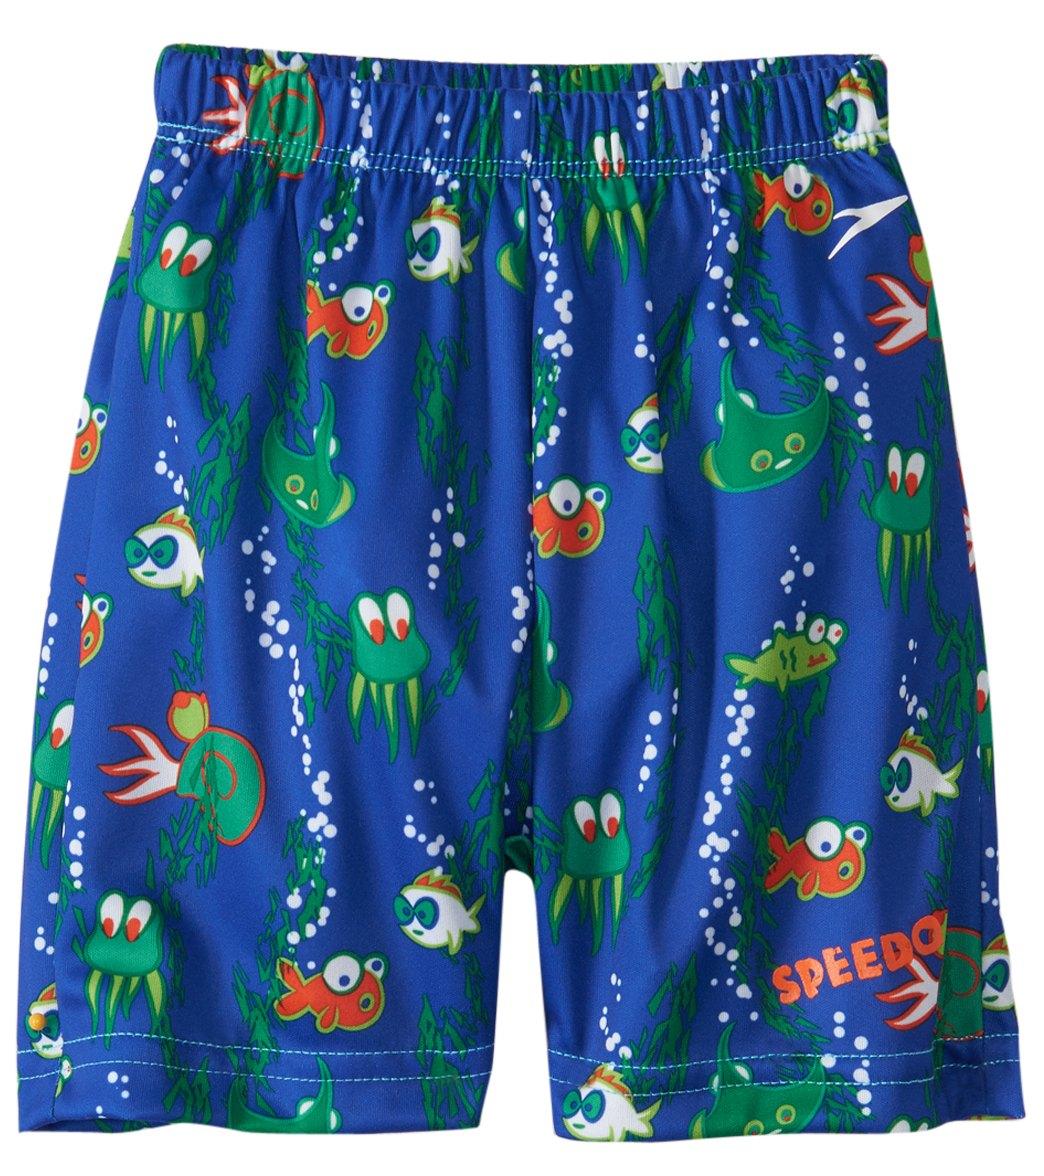 48f00ee0e9 Speedo Boys' Swim Diaper (Infant-2T) at SwimOutlet.com